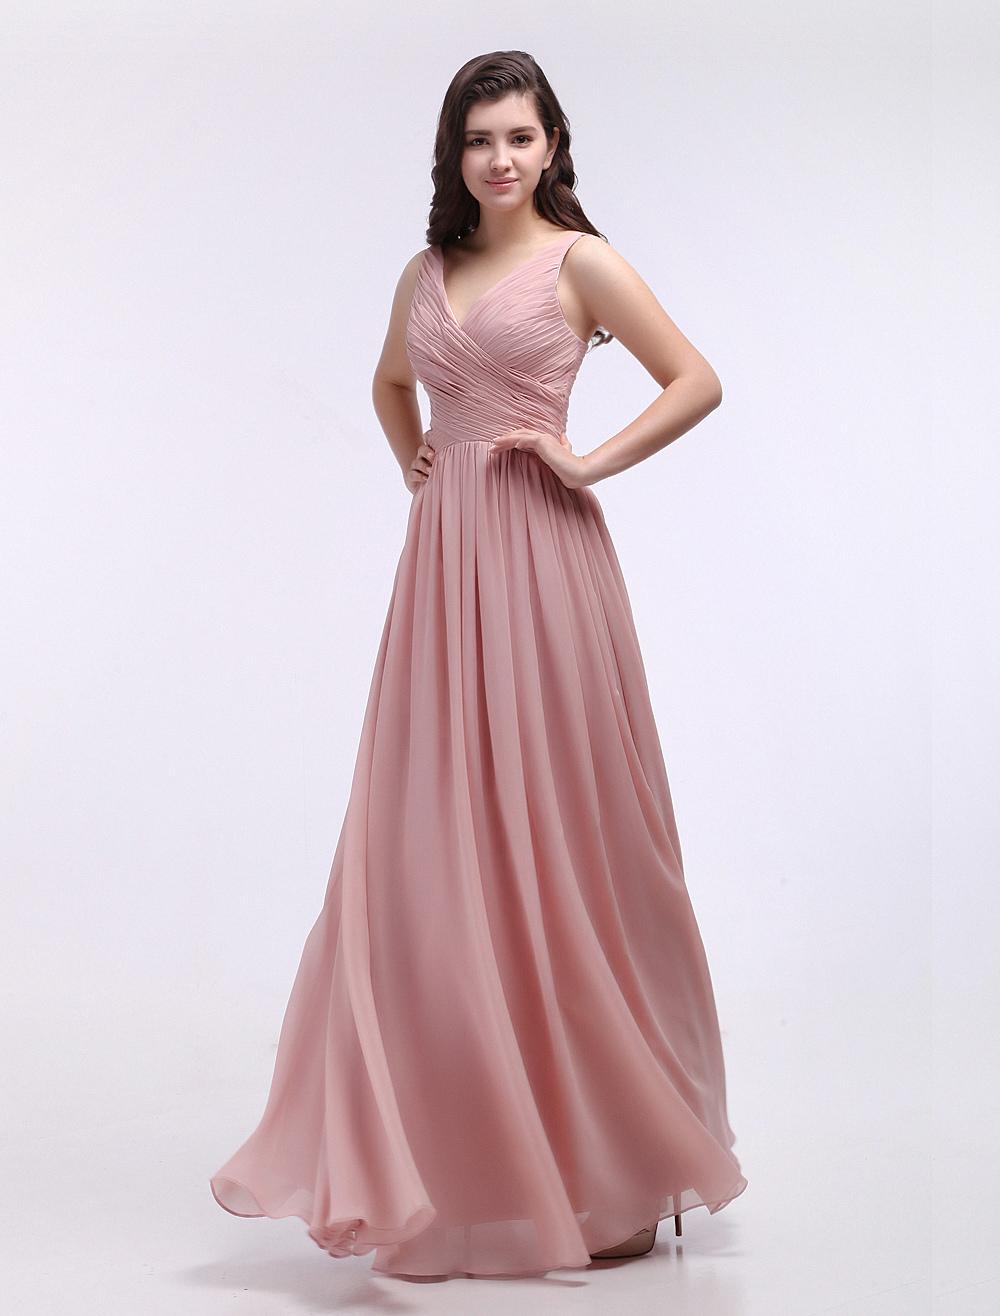 Dusty Pink Bridesmaid Dresses V Neck Ruched Chiffon Nude Grace Bridesmaid Dress (Wedding) photo